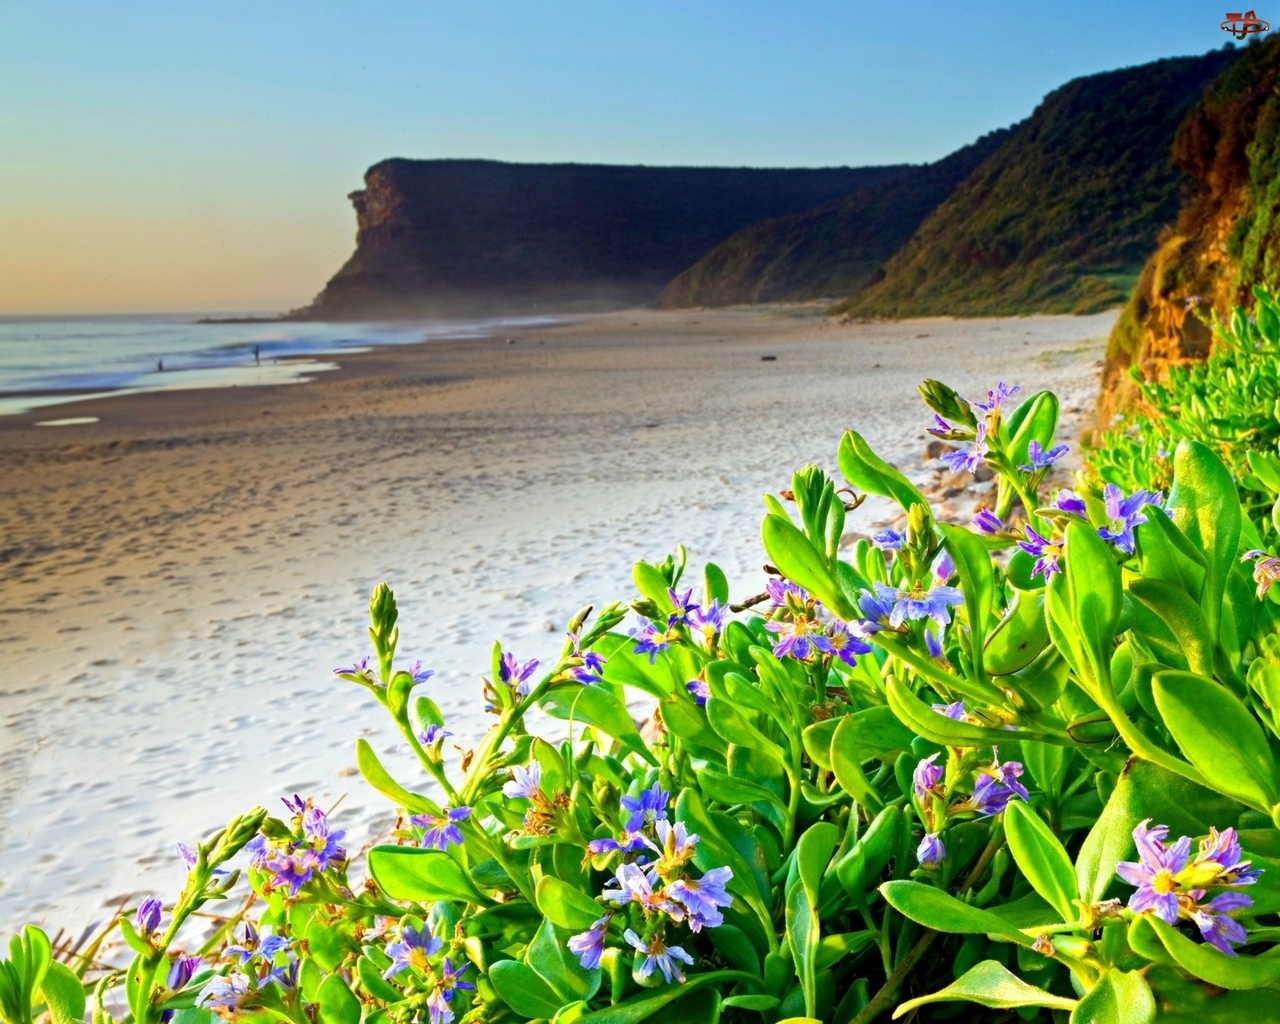 Klif, Plaża, Kwiaty